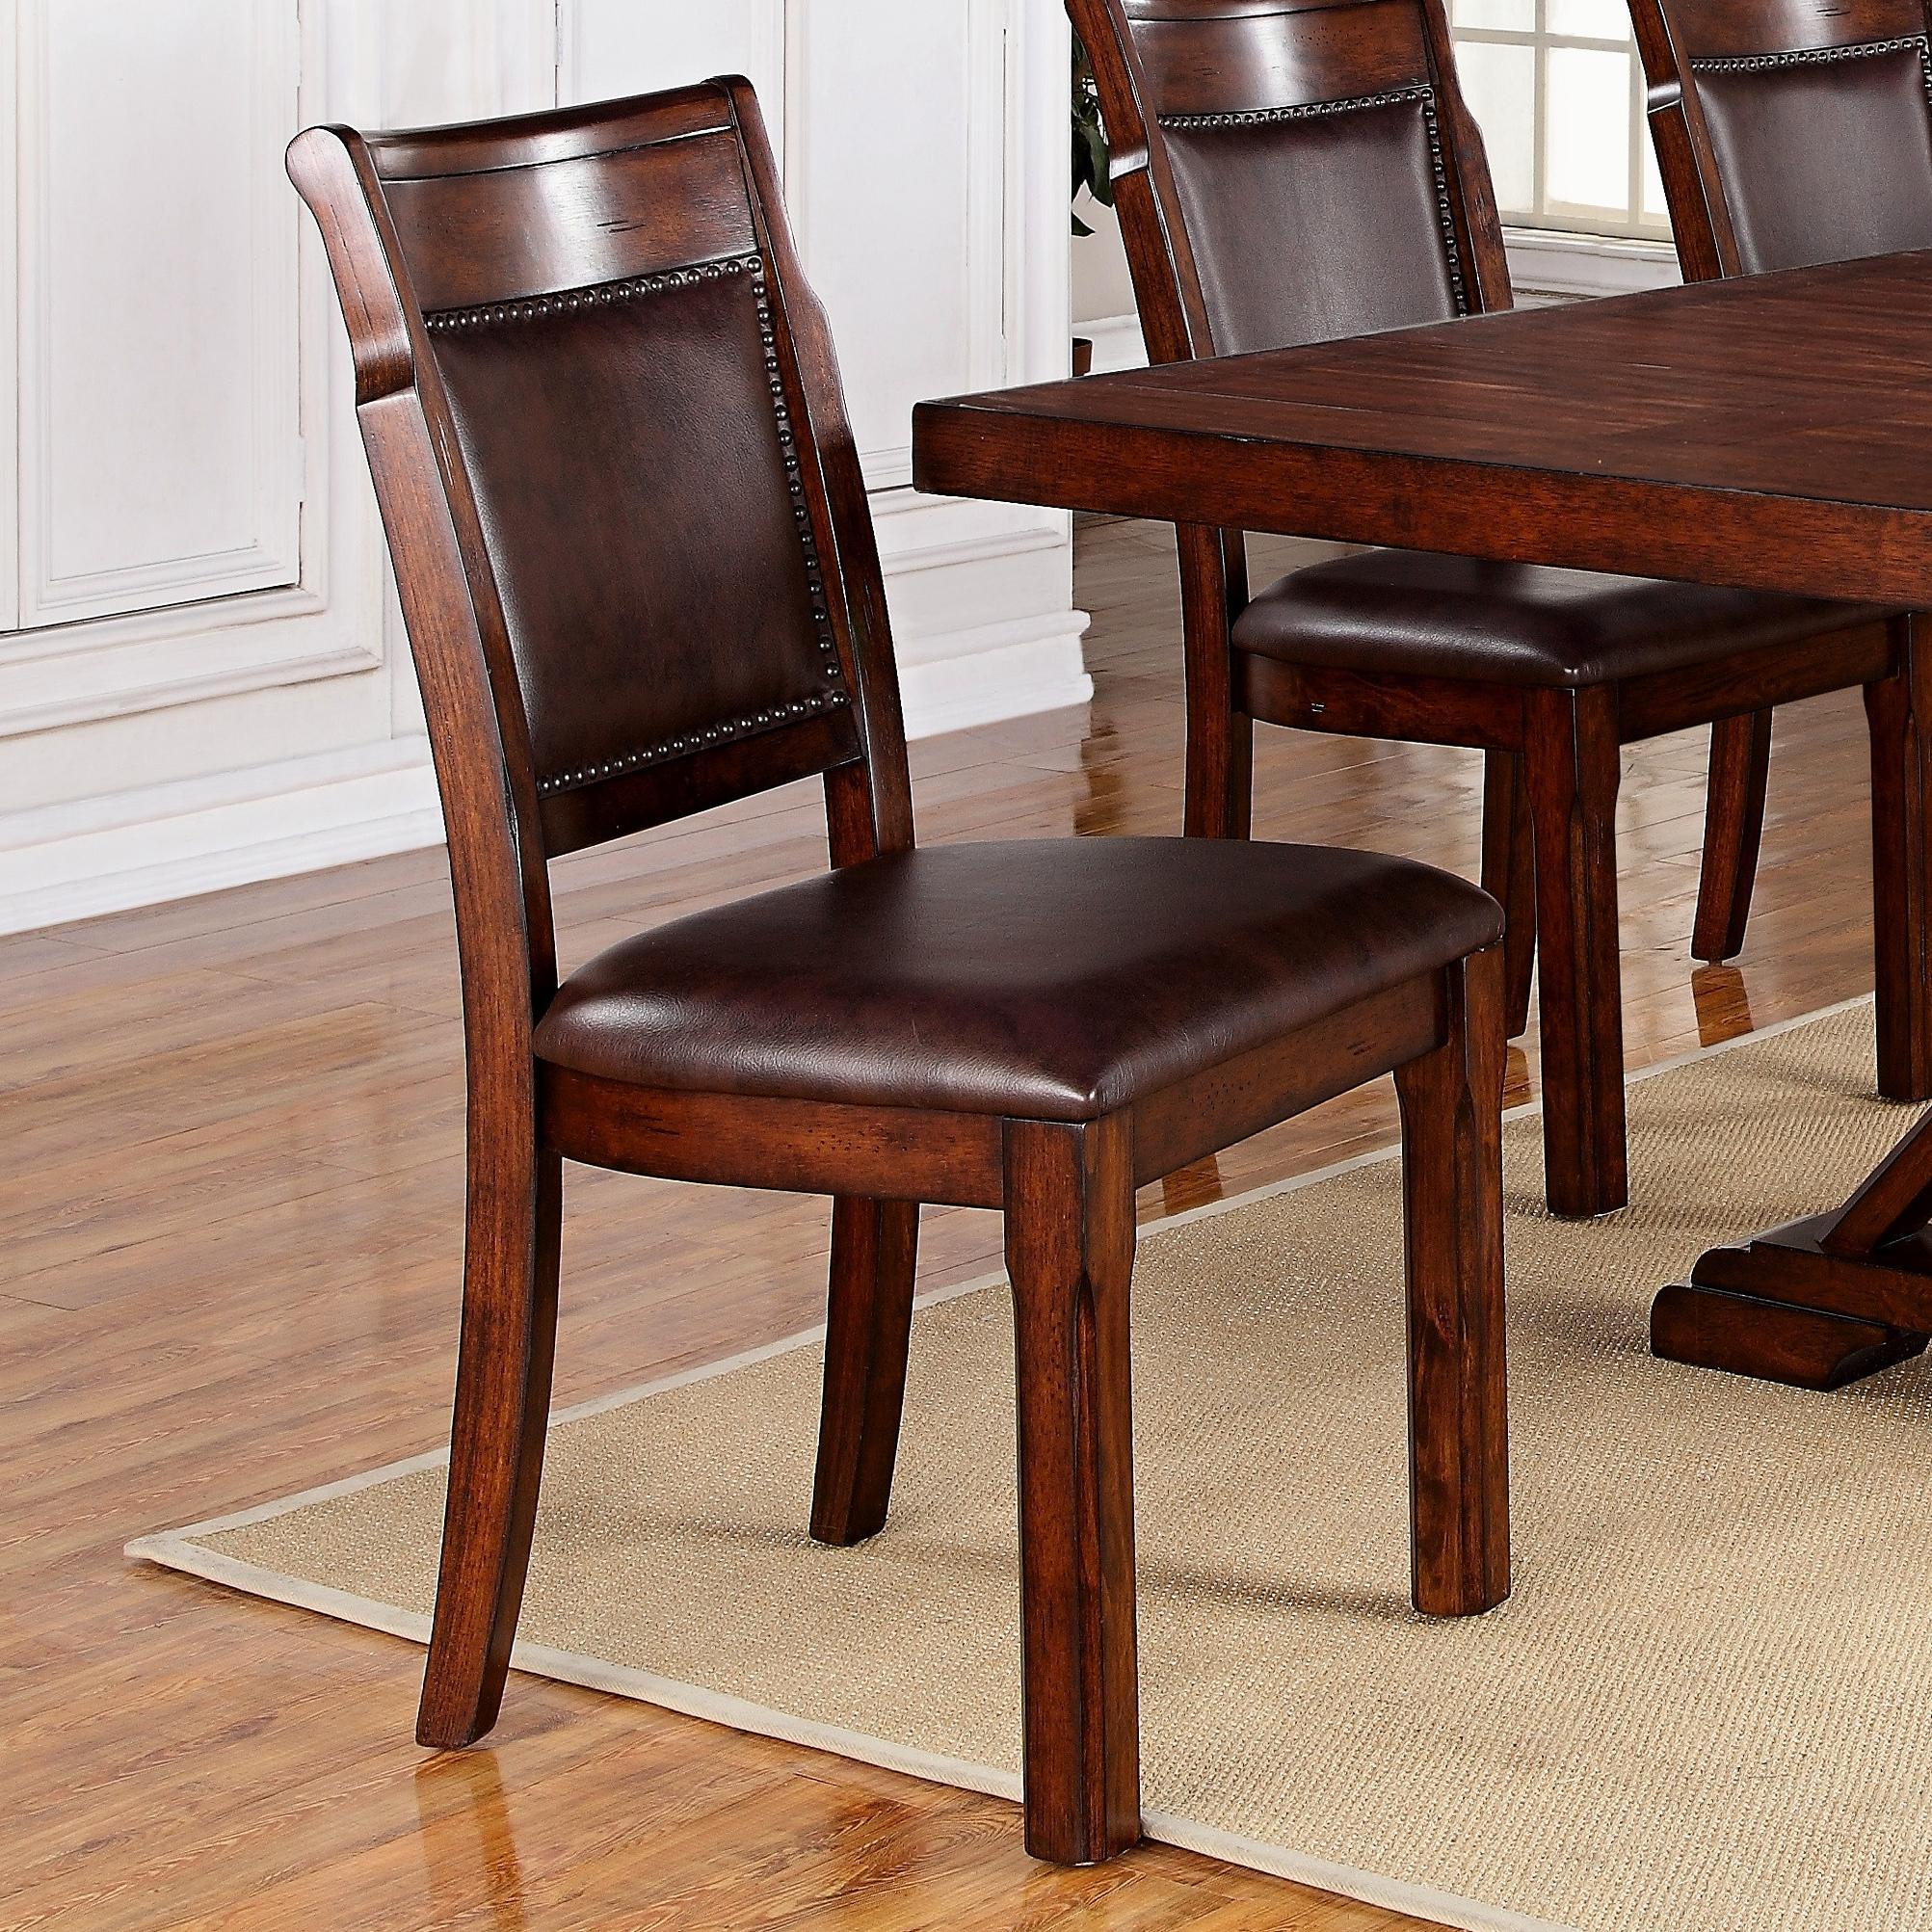 Cascade Cascade Side Chair by HH at Walker's Furniture